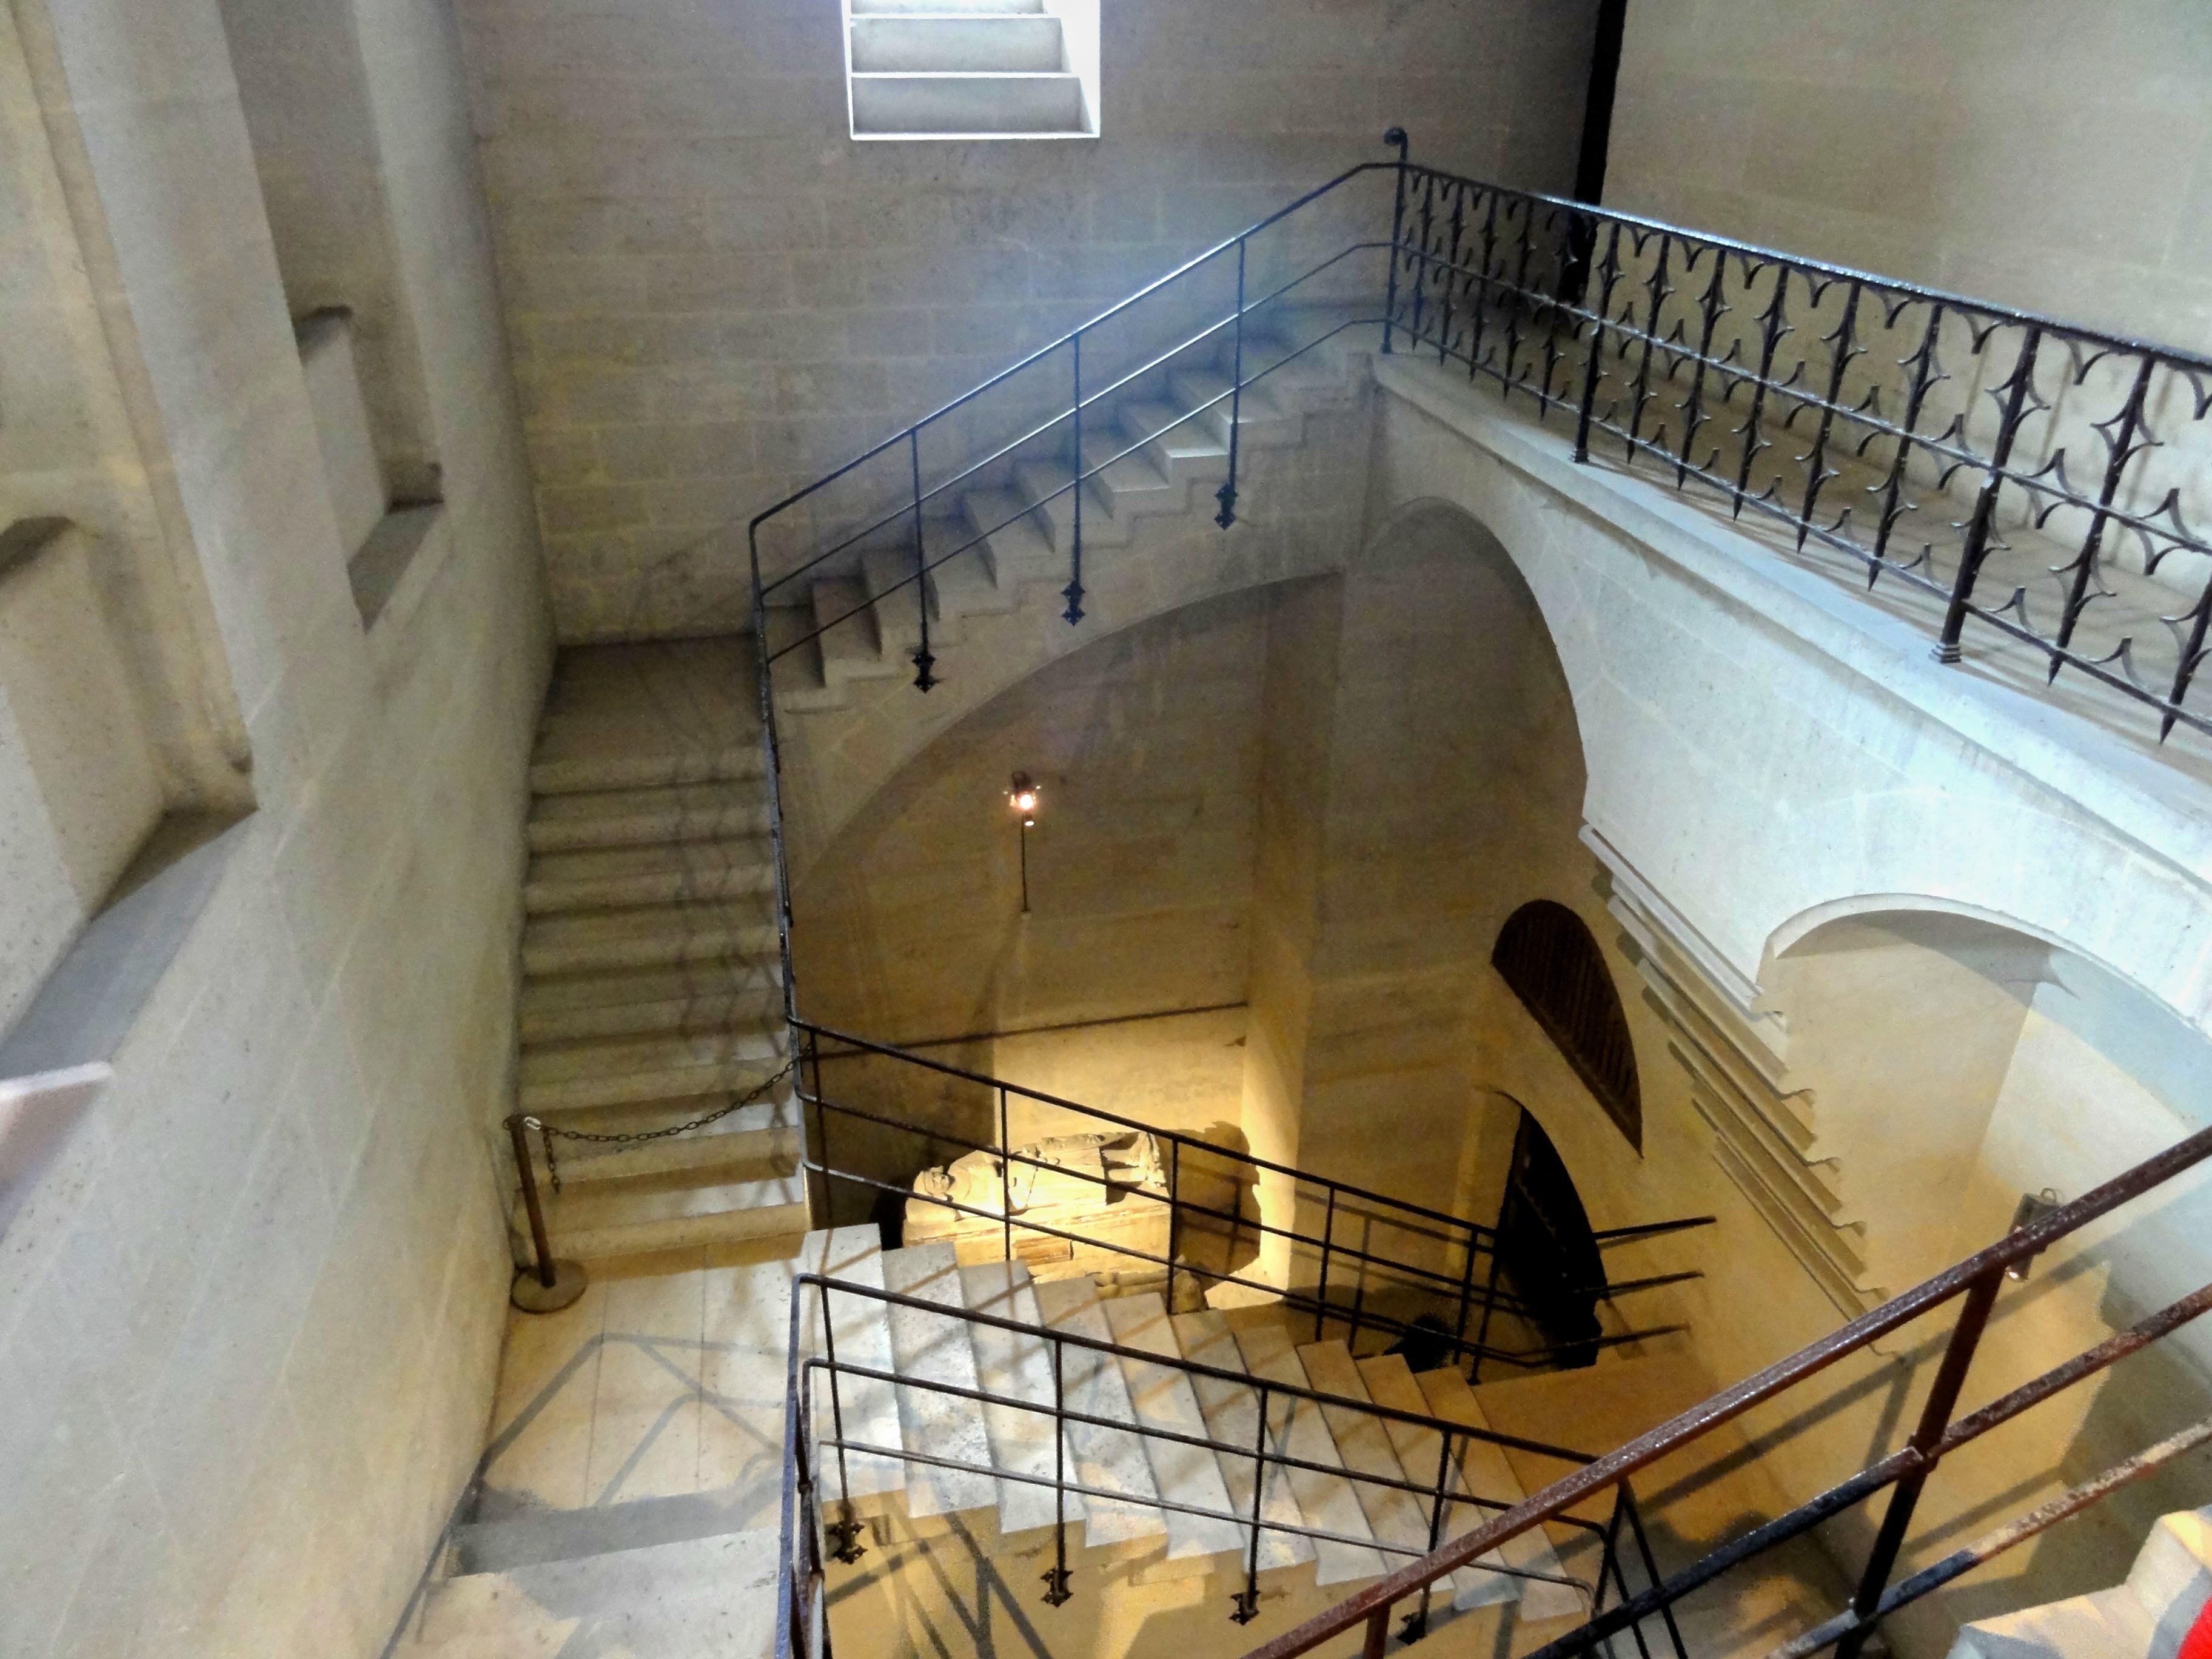 file pierrefonds 60 ch teau escalier vers la wikimedia commons. Black Bedroom Furniture Sets. Home Design Ideas